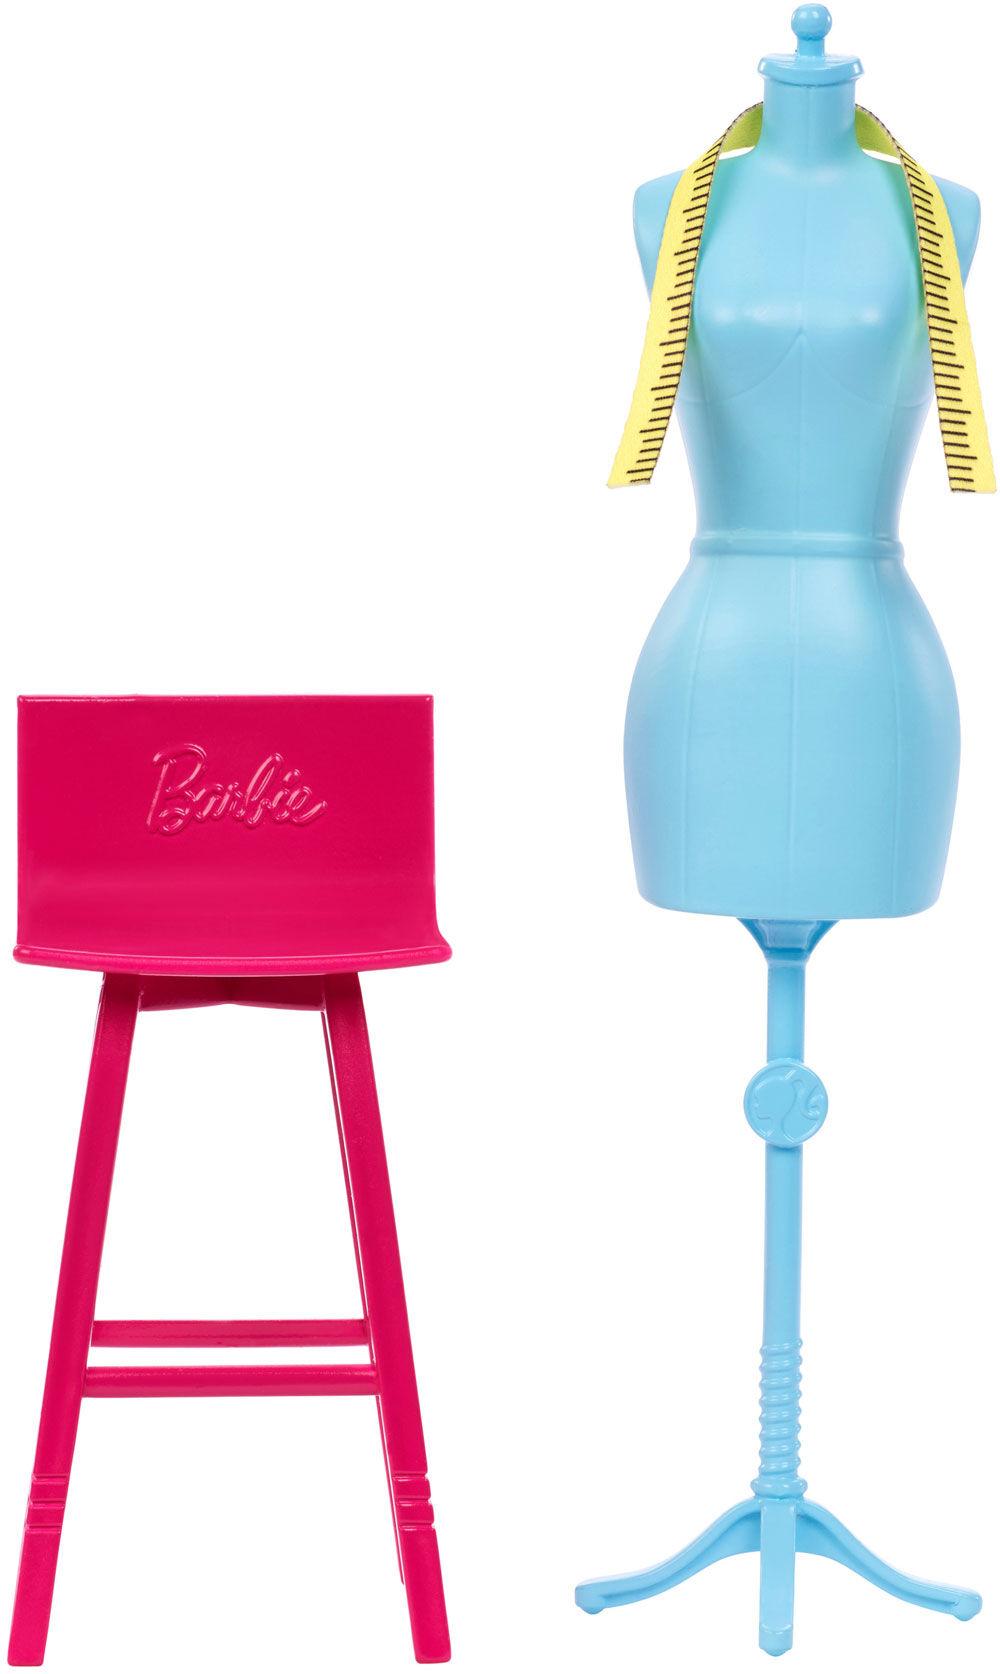 Barbie Career Places Fashion Design Studio Play Set